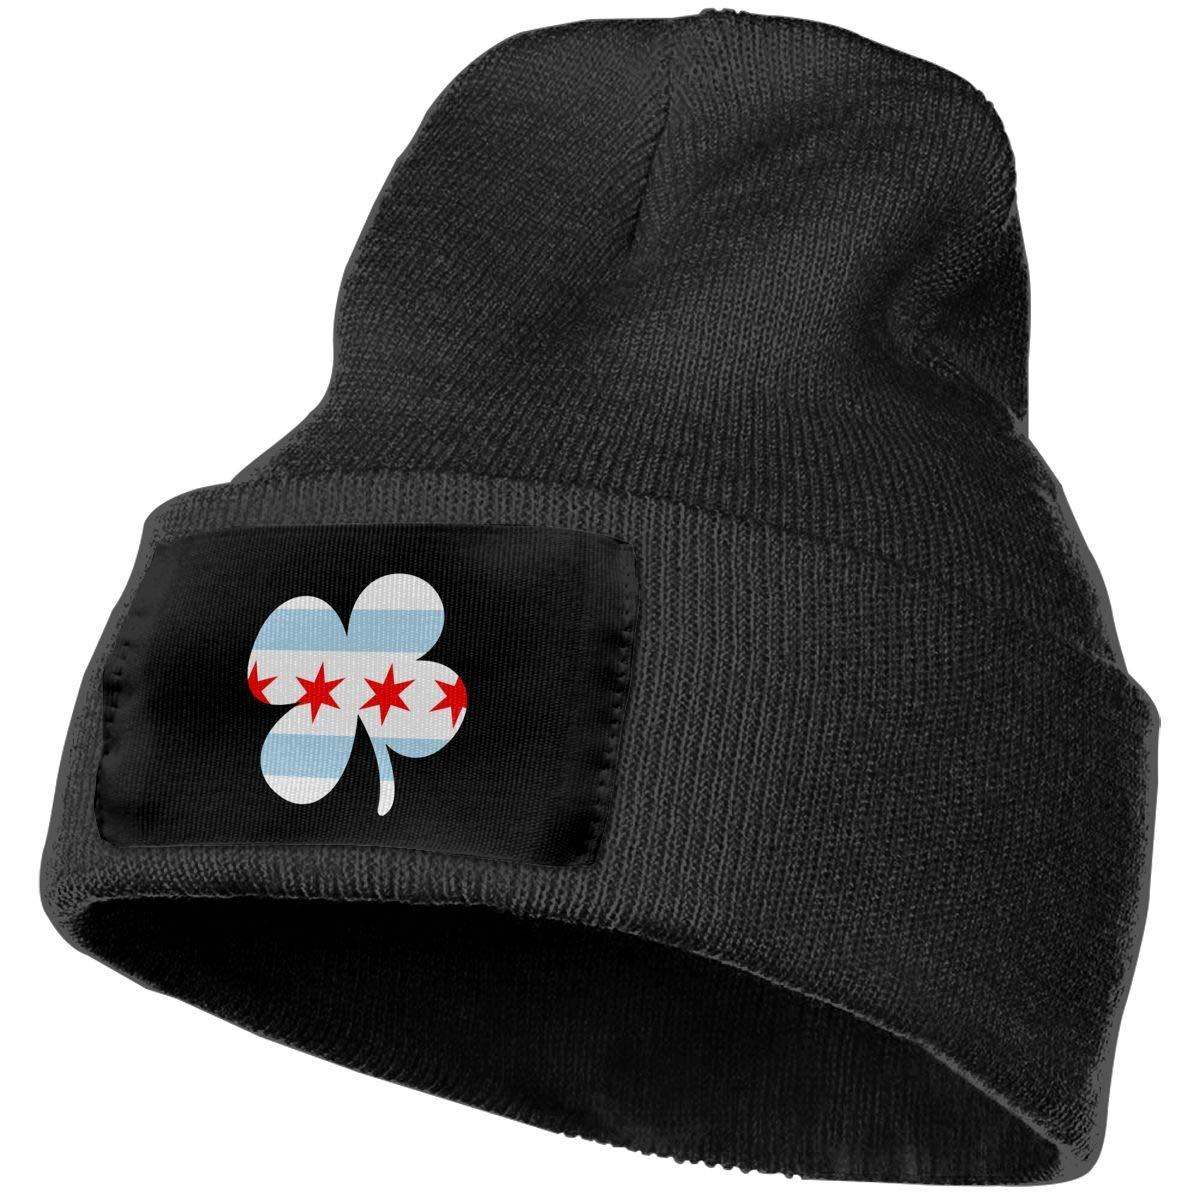 COLLJL-8 Men /& Women Irish Chicago Flag Shamrock Outdoor Fashion Knit Beanies Hat Soft Winter Skull Caps